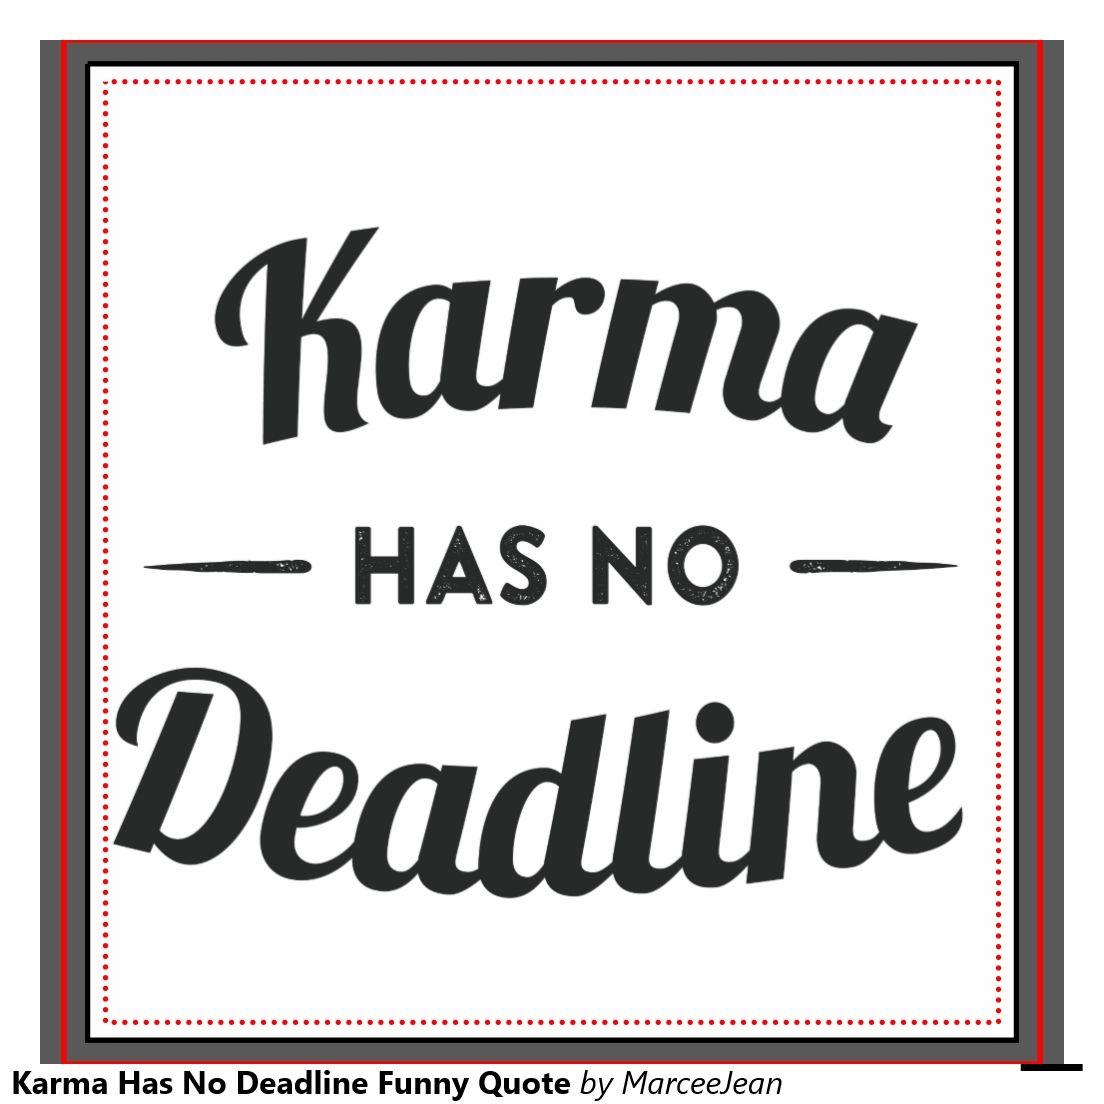 Karma Has No Deadline Funny Quote Bandana Karma Quotes Funny Quotes Karma Has No Deadline